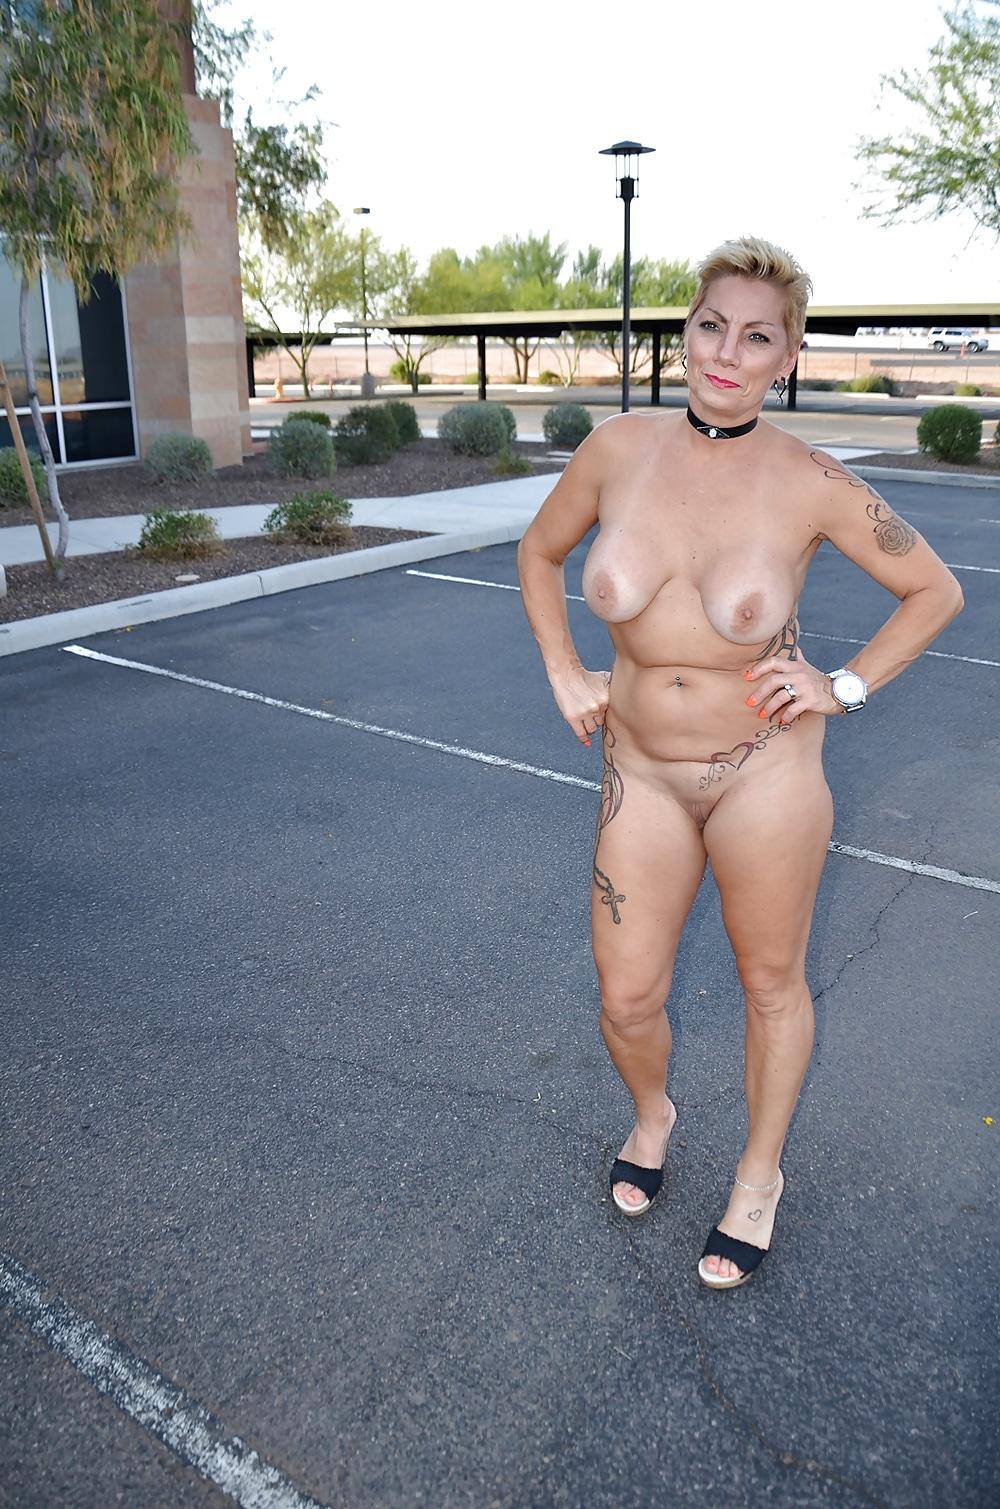 Milf sripped nude in public — photo 3